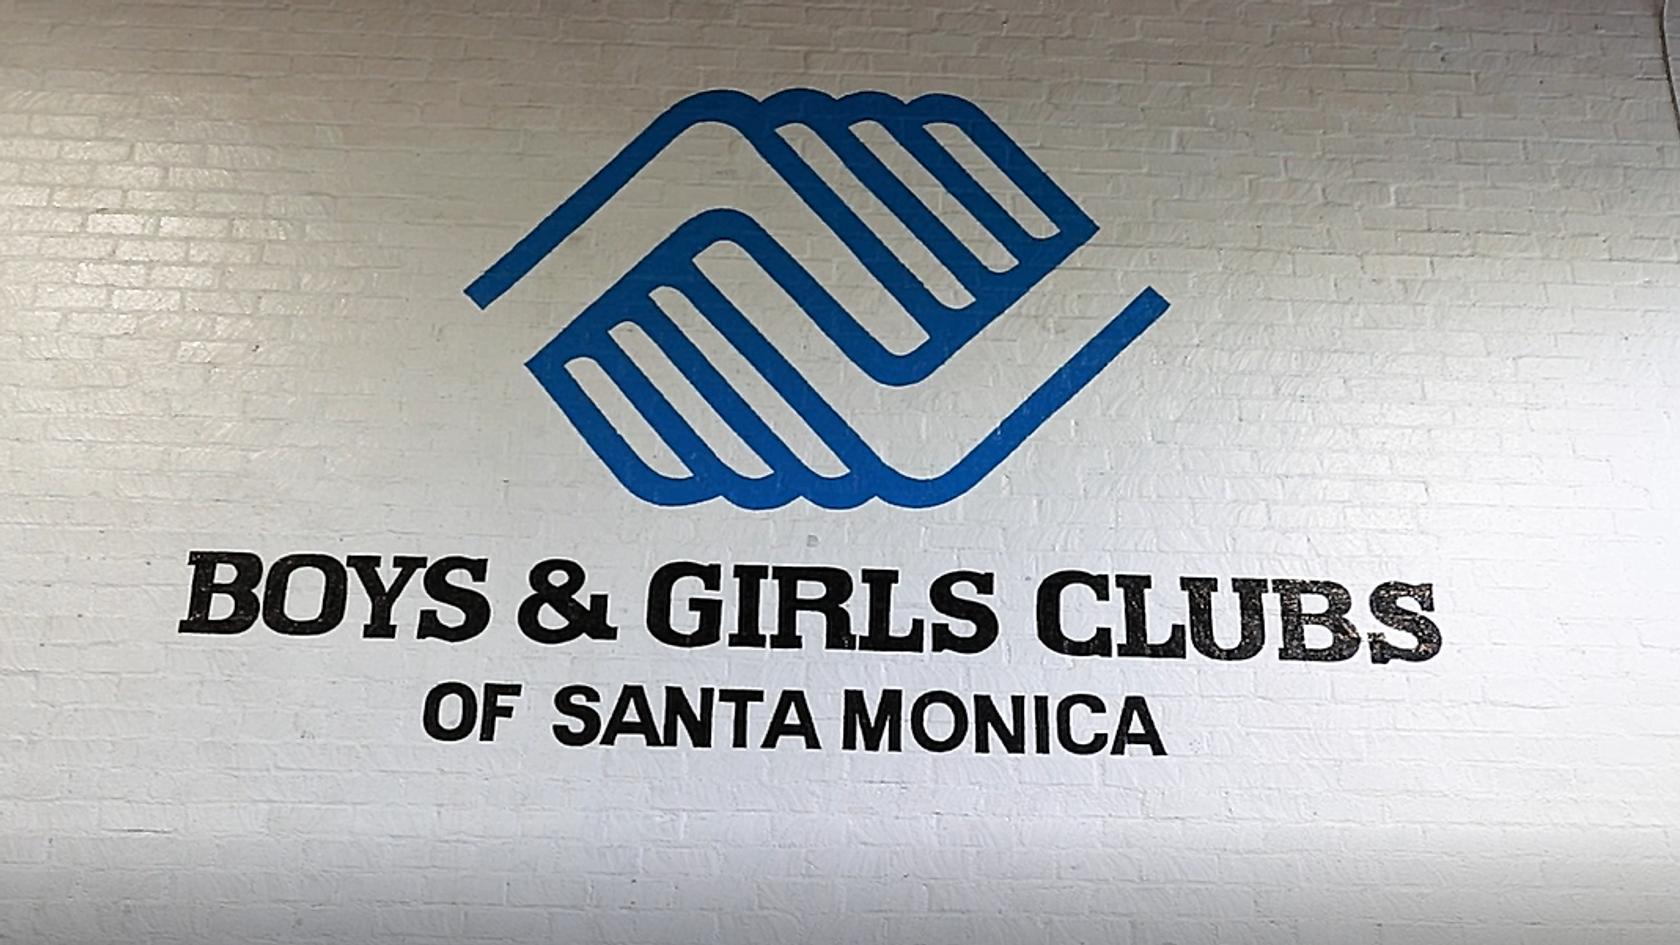 Celebrating the Boys & Girls Club of Santa Monica 2018 Honorees